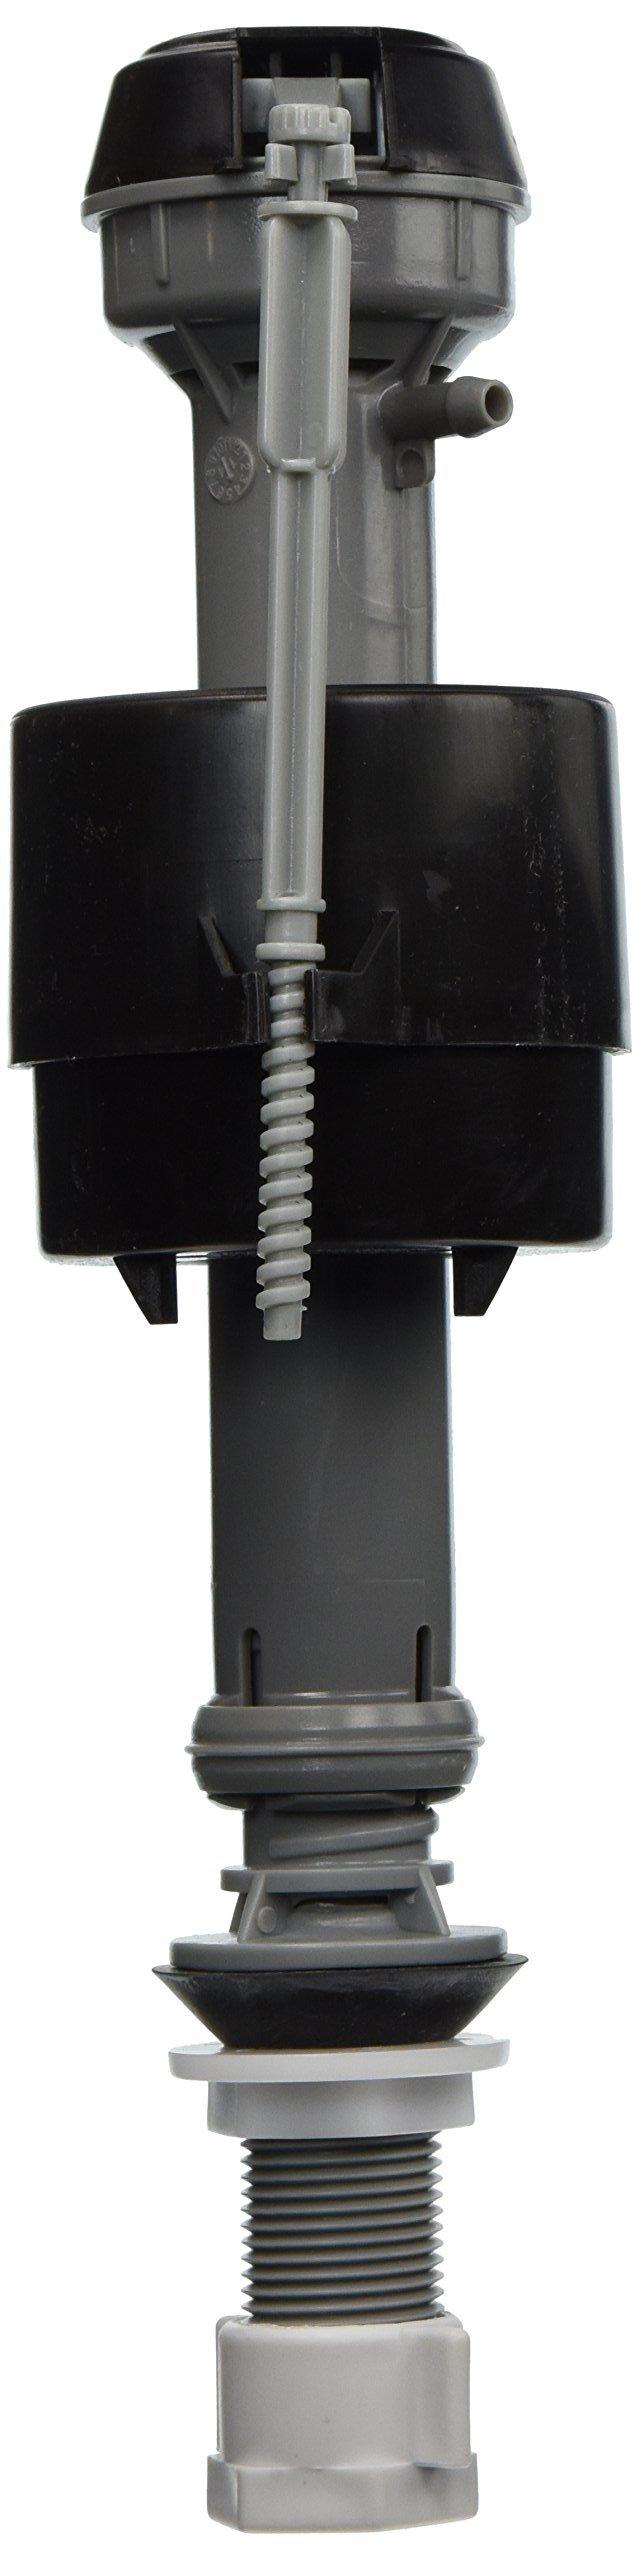 EZ-FLO 40202 Adjustable Anti-Siphon Fill Valve